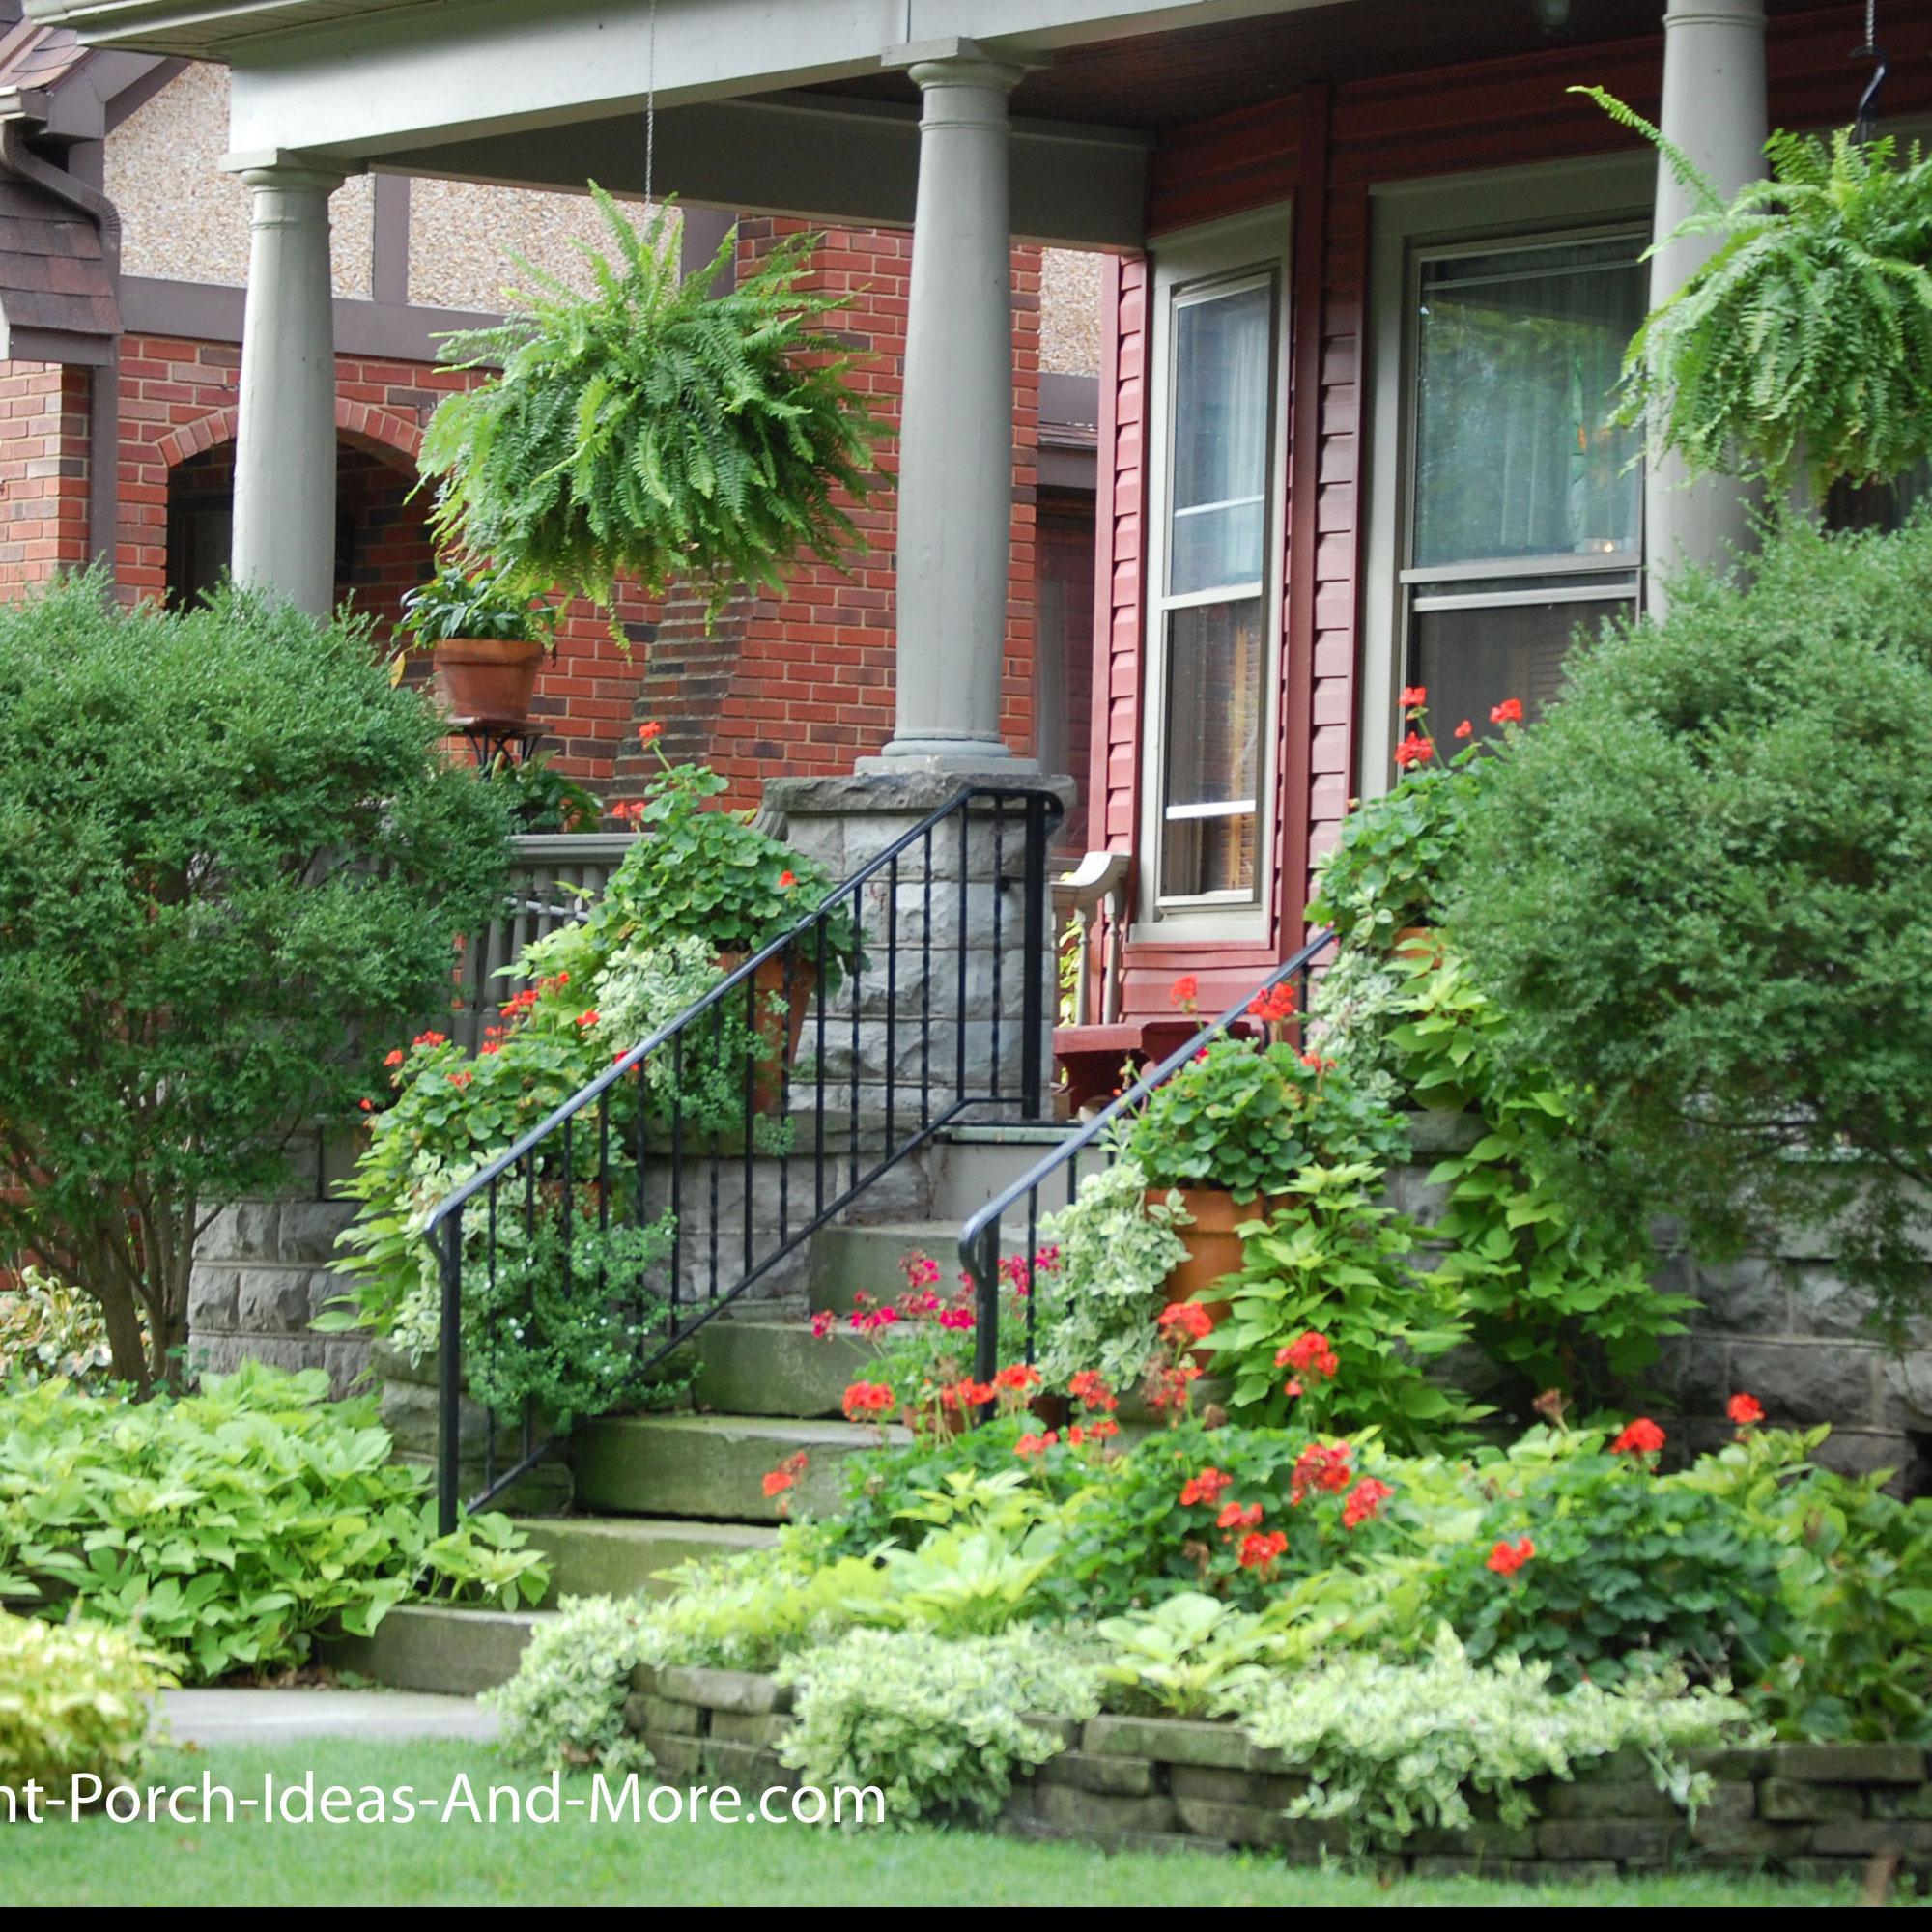 designed landscape for front yard and porch